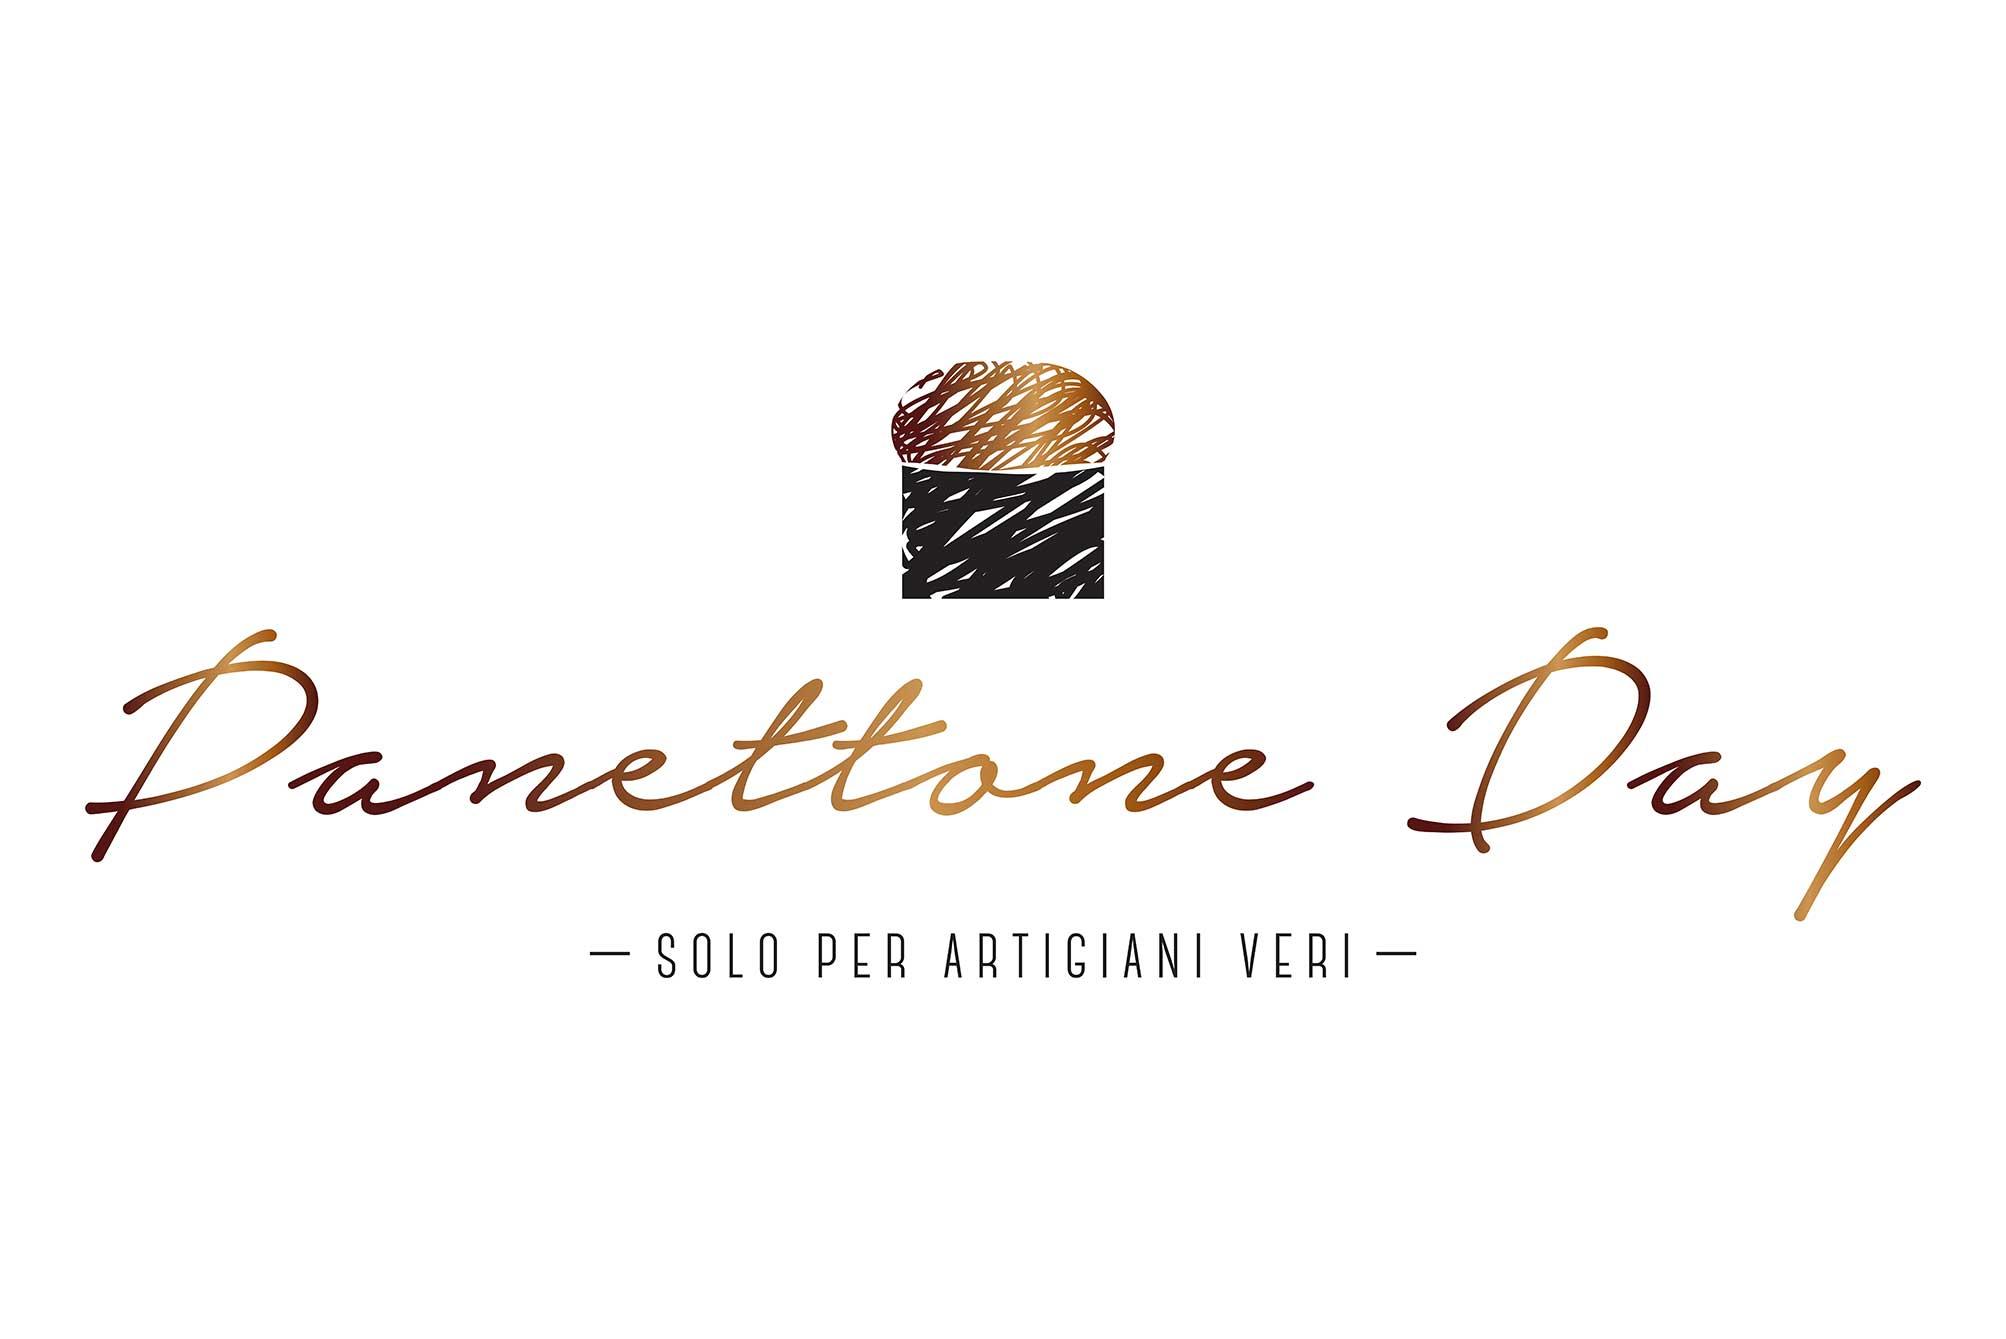 panettone day 2021 logo